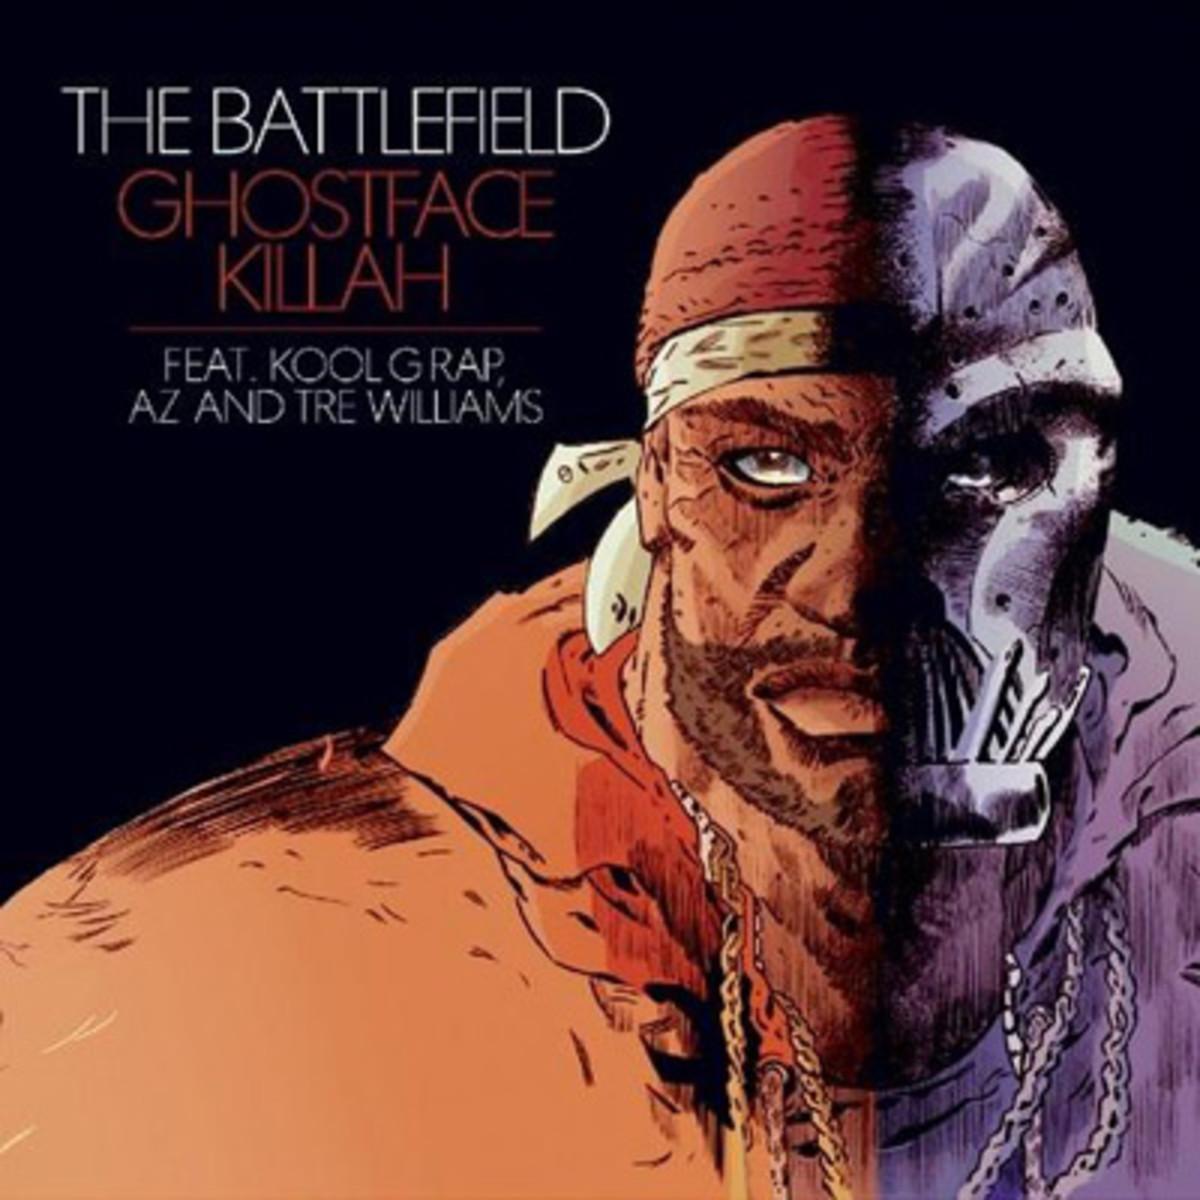 ghostfacekillah-thebattlefield.jpg